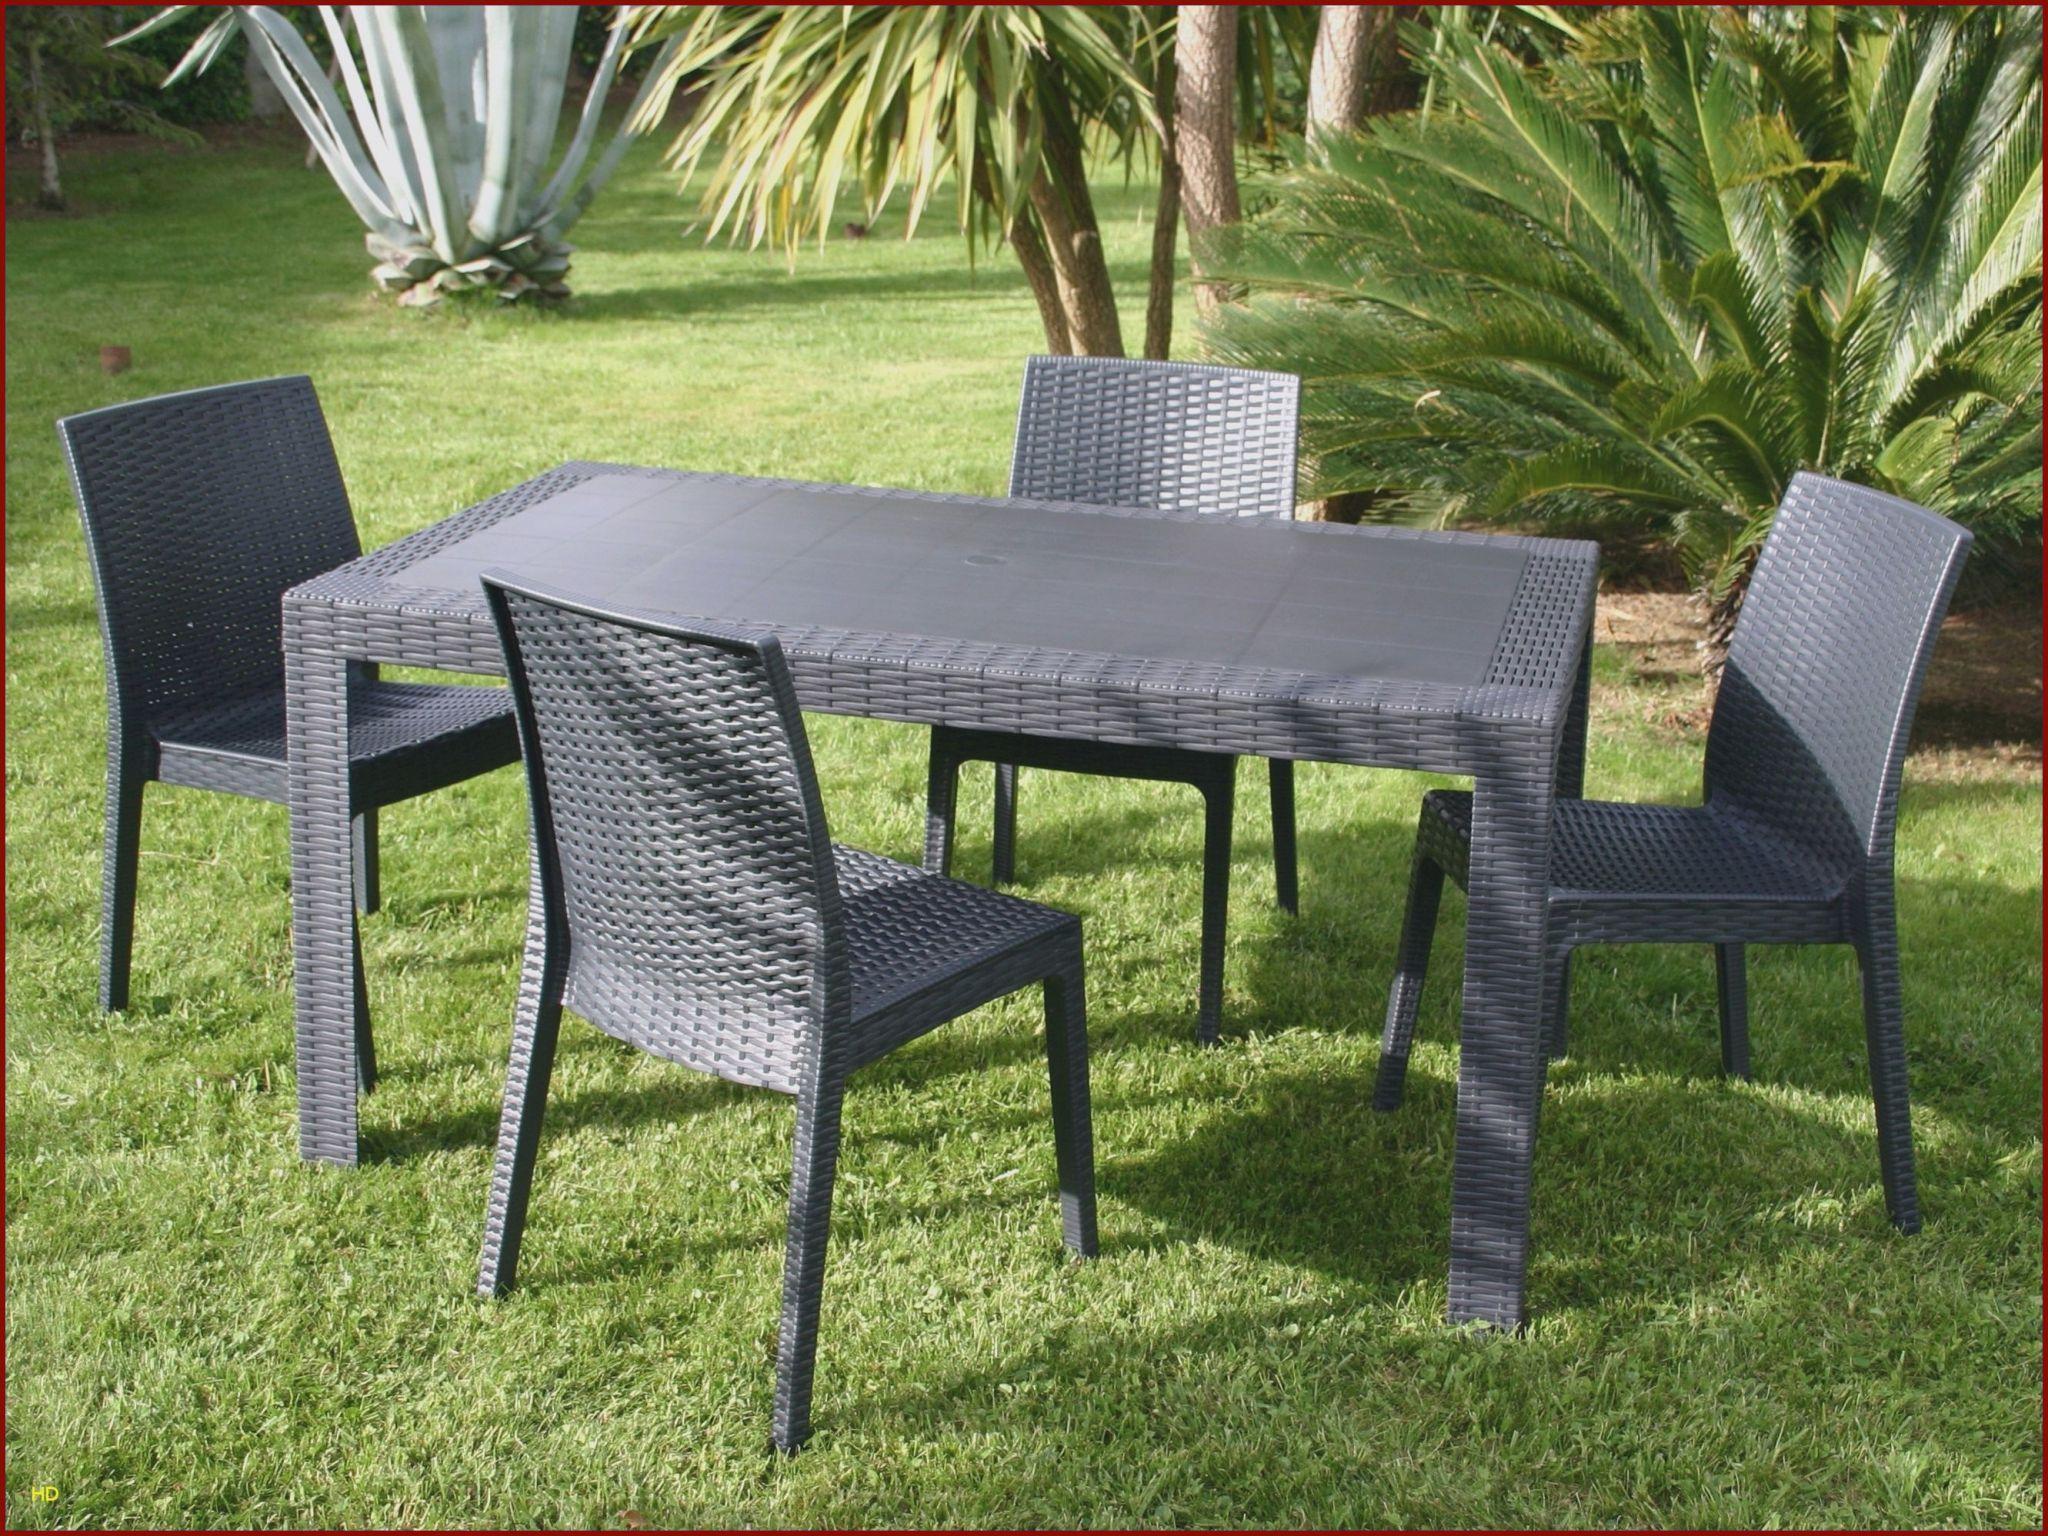 Chaises Luxe Chaise Ice 0D Table Jardin Resine Lovely ... concernant Tables De Jardin Pas Cher